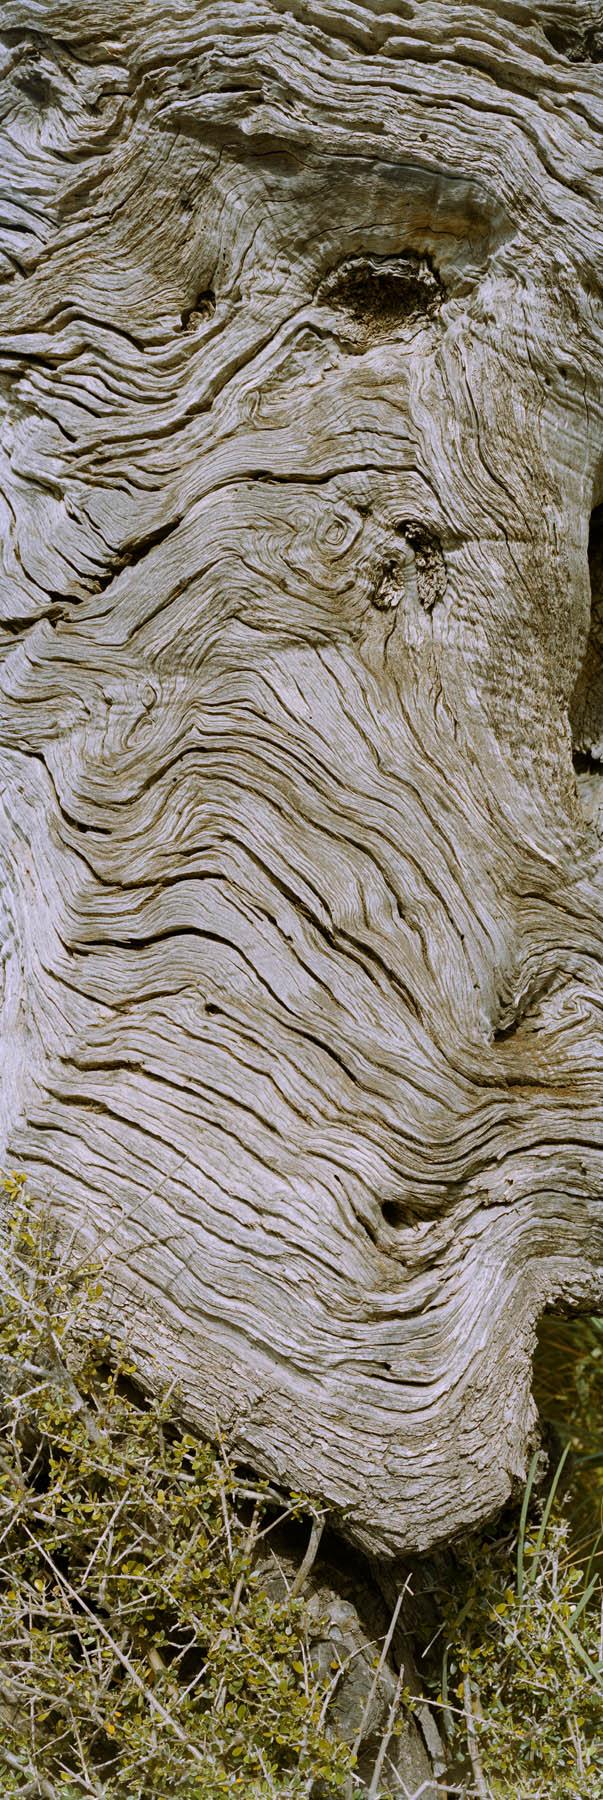 large format photography, Grossformatfotografie, Grossformatphotographie, Fotografie, Photographie, photography, 6x17, Macro, Makro, Rinde, bark, tree, Baum, Borke, Flechten, lichen, Holz, Wood, braun, brown